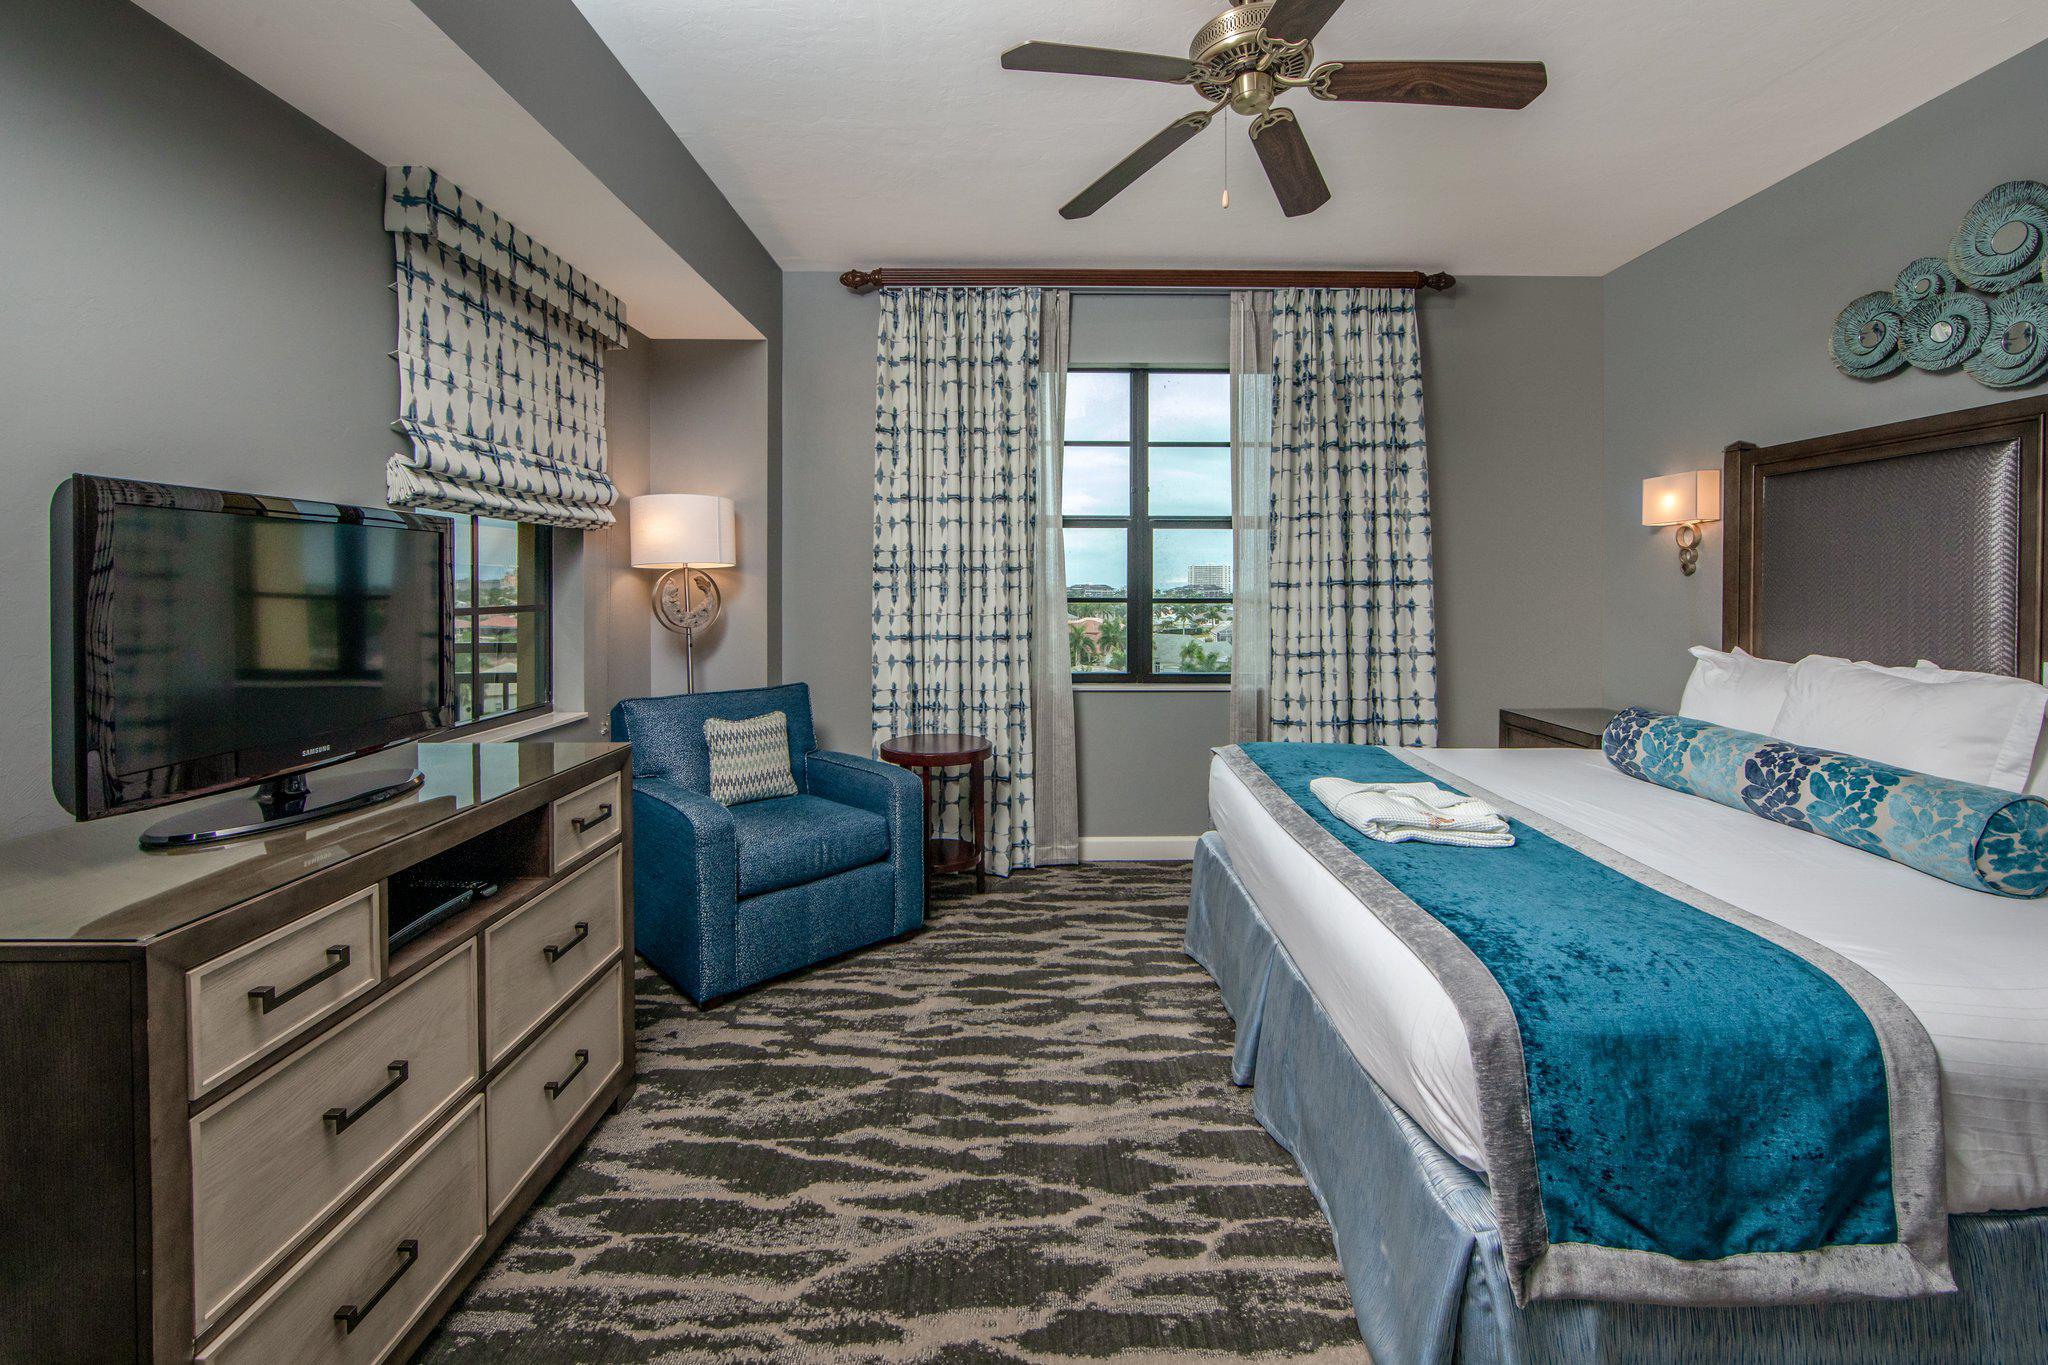 Holiday Inn Club Vacations Sunset Cove Resort